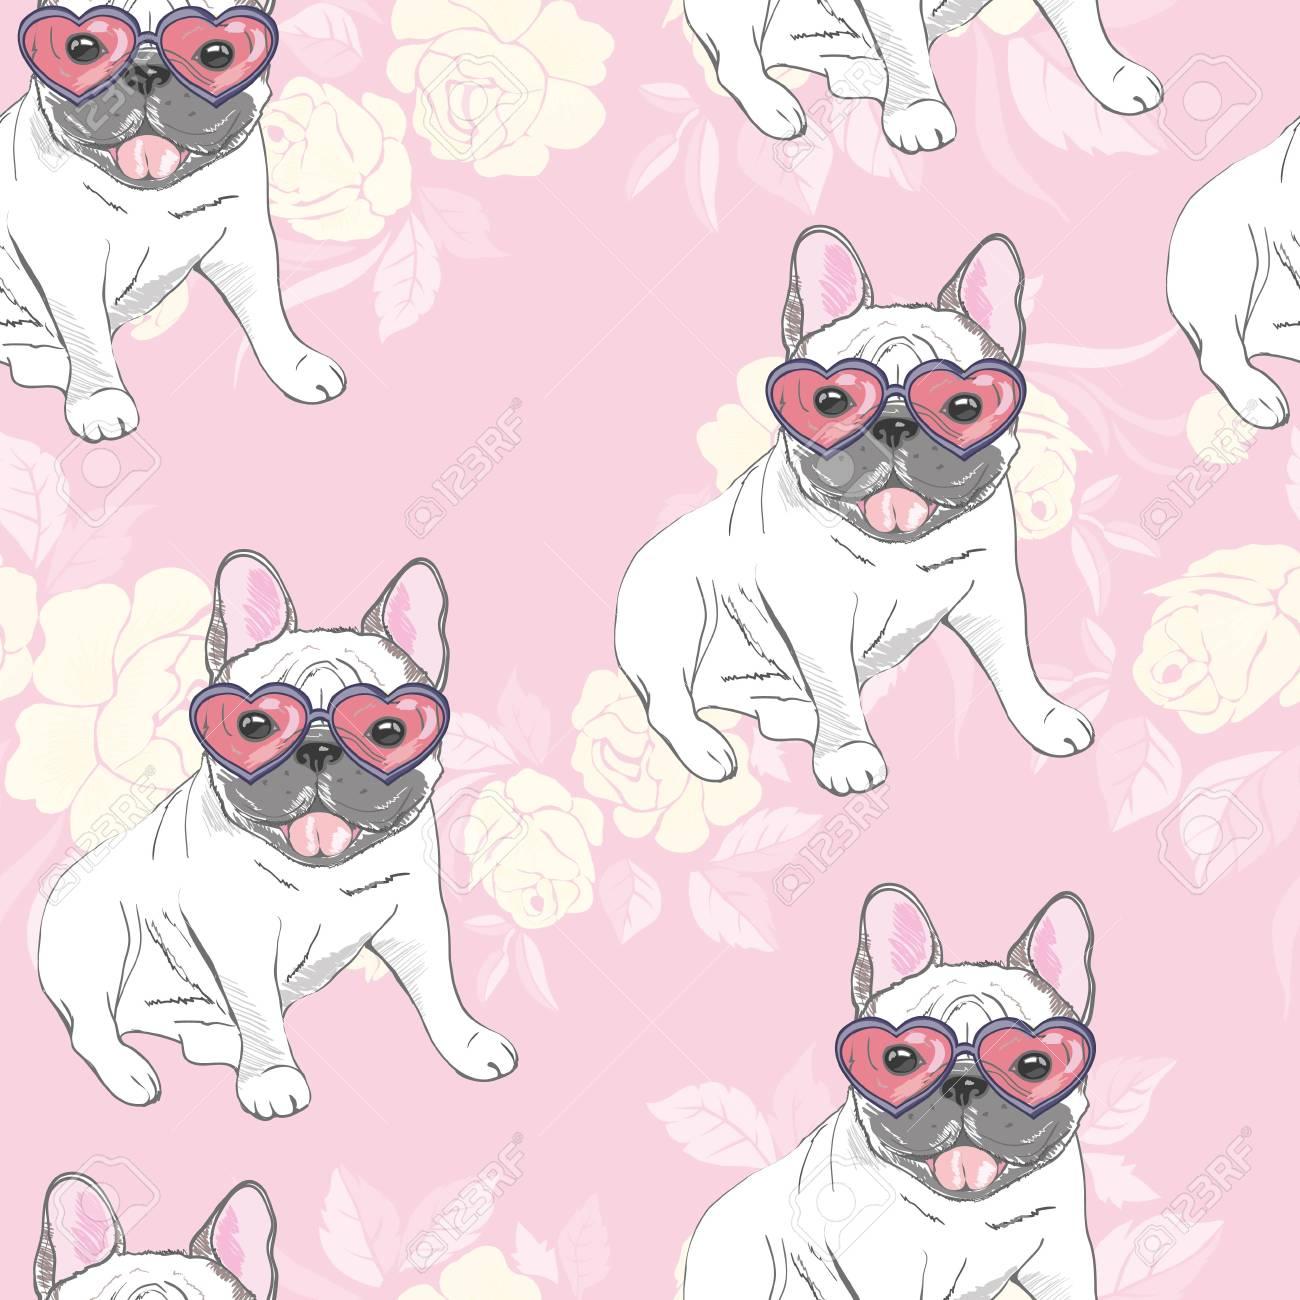 dog. french bulldog. heart sunglasses. glasses icon. illustration seamless pattern wallpaper background - 96717698